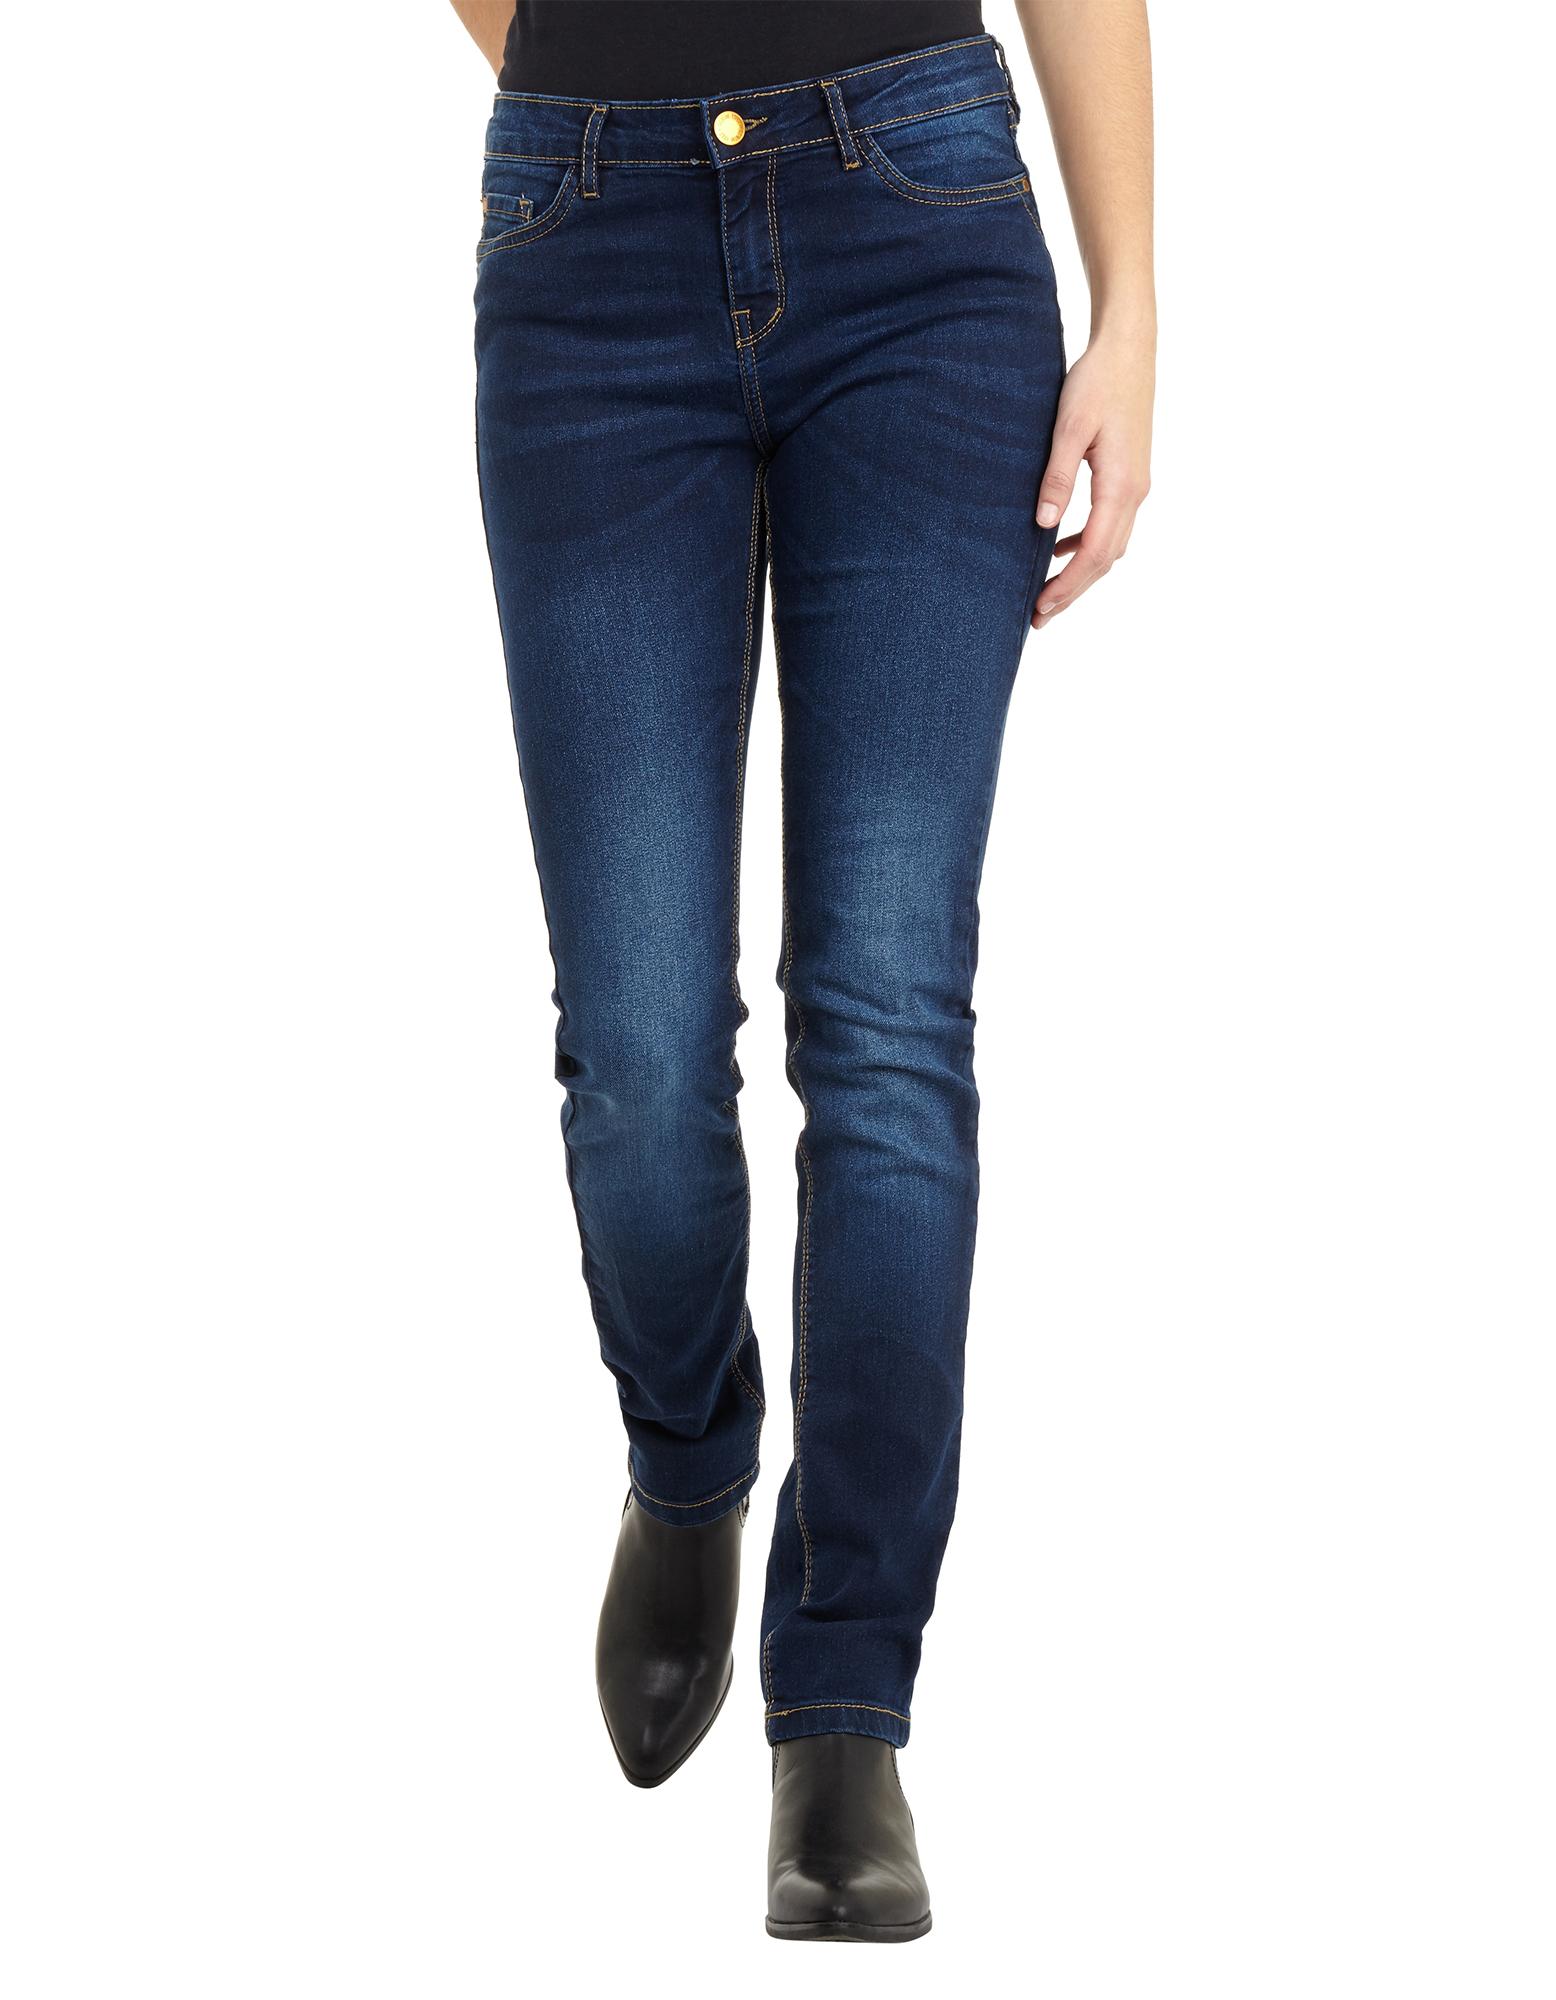 damen stone washed slim fit jeans takko fashion. Black Bedroom Furniture Sets. Home Design Ideas